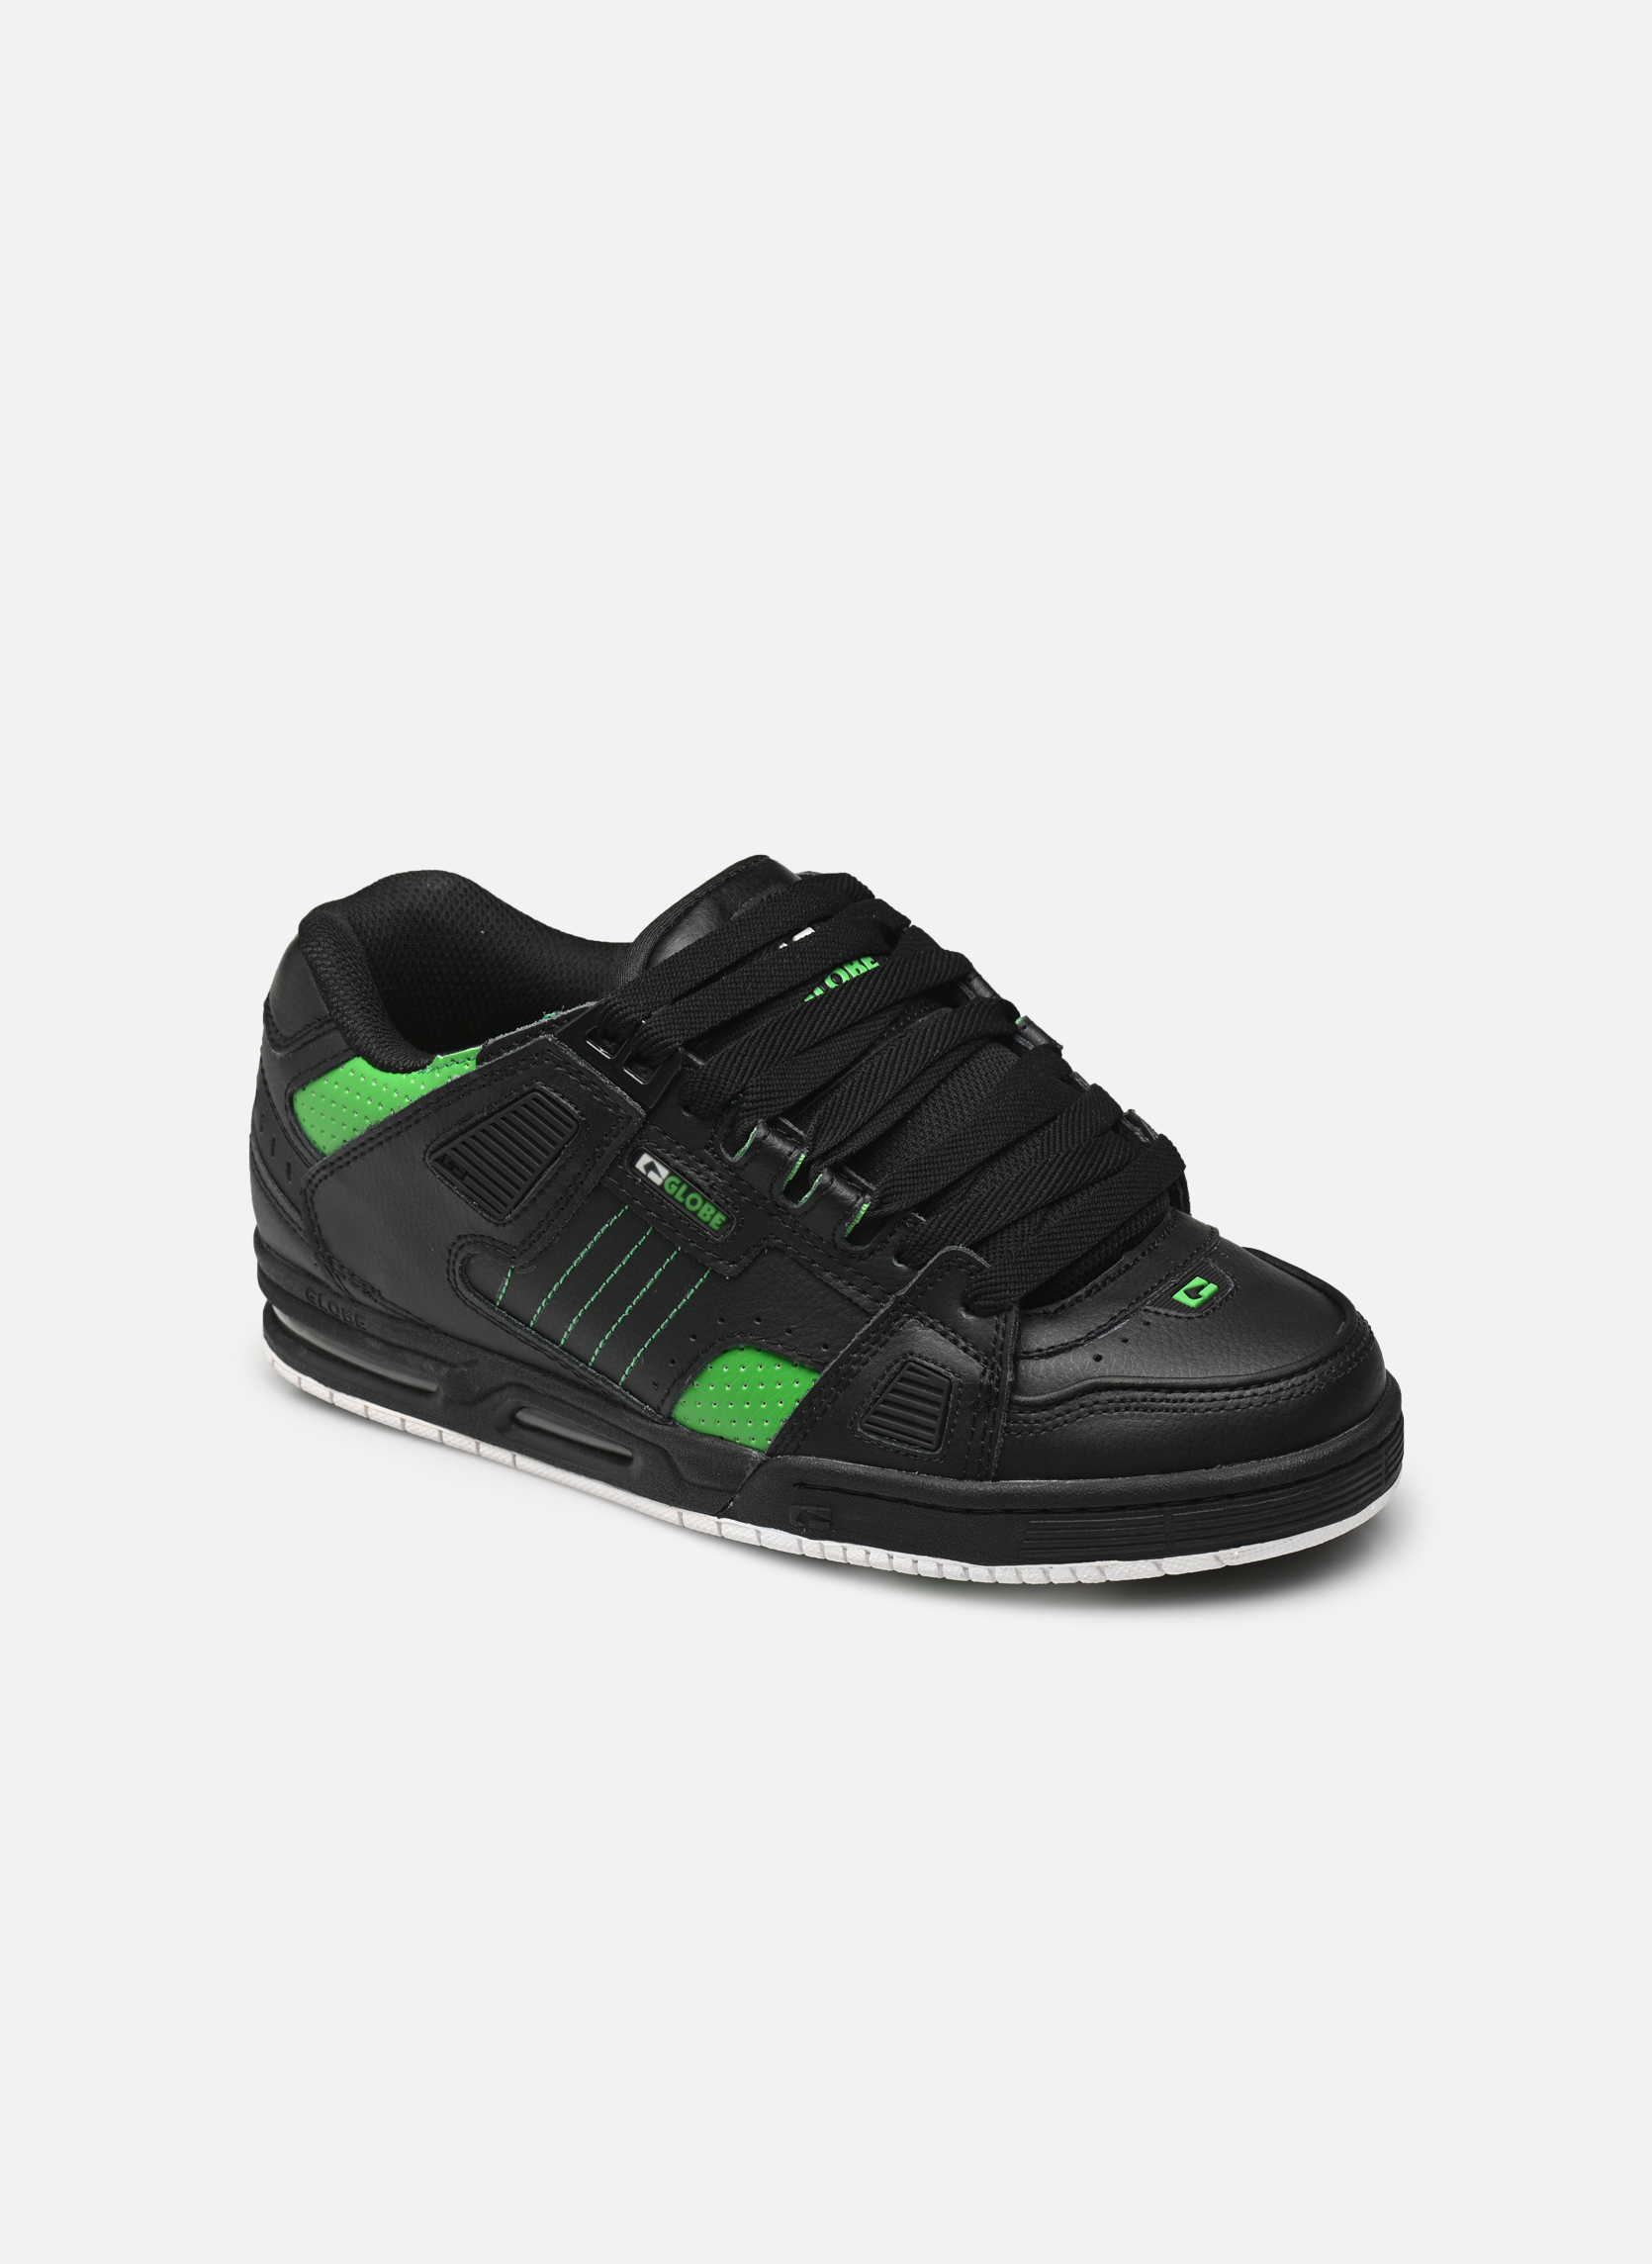 Black moto green